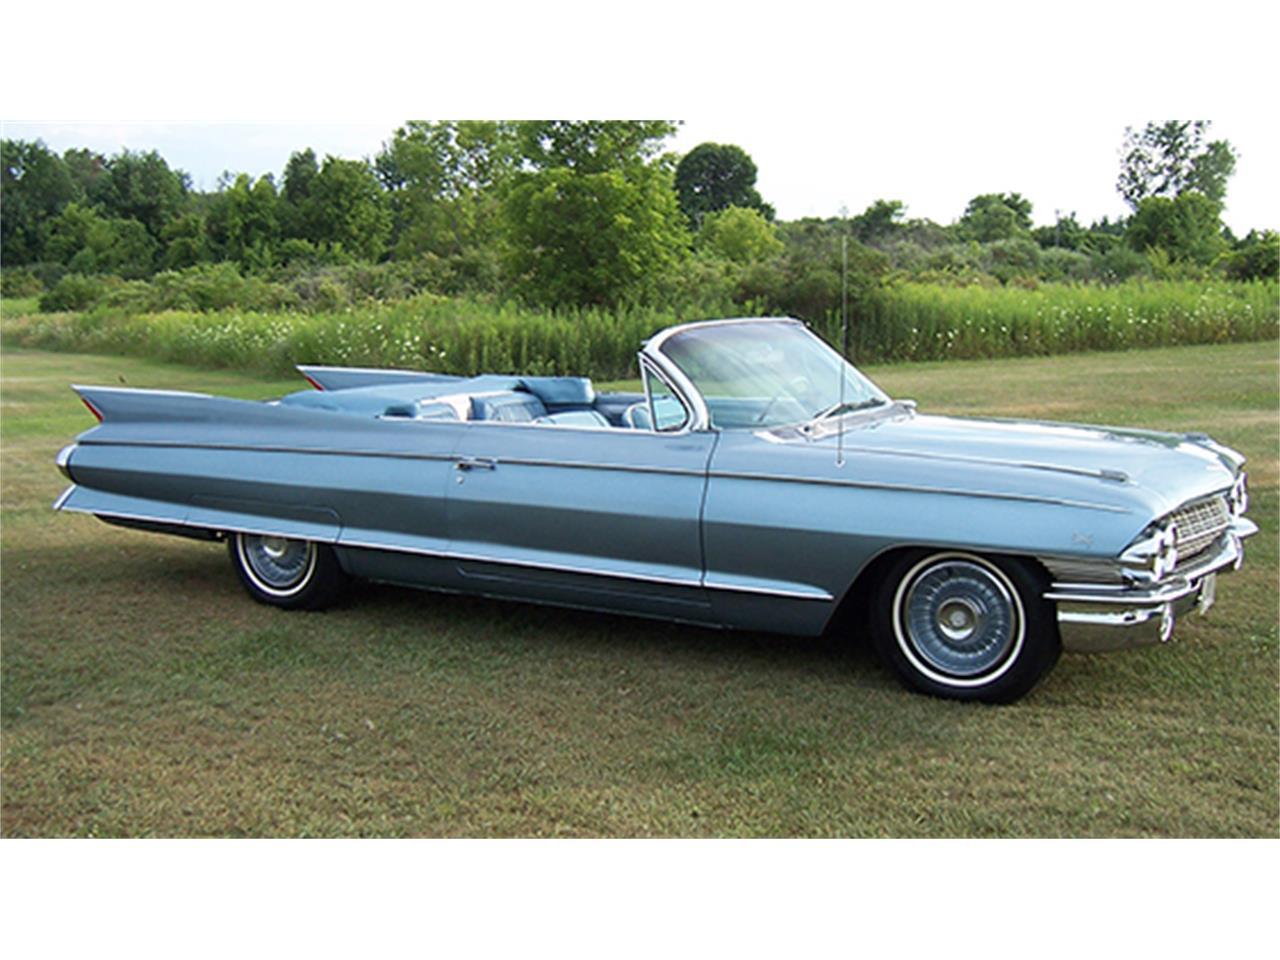 1961 Cadillac Eldorado Biarritz Convertible For Sale Classiccars El Dorado Large Picture Of 61 J3k0